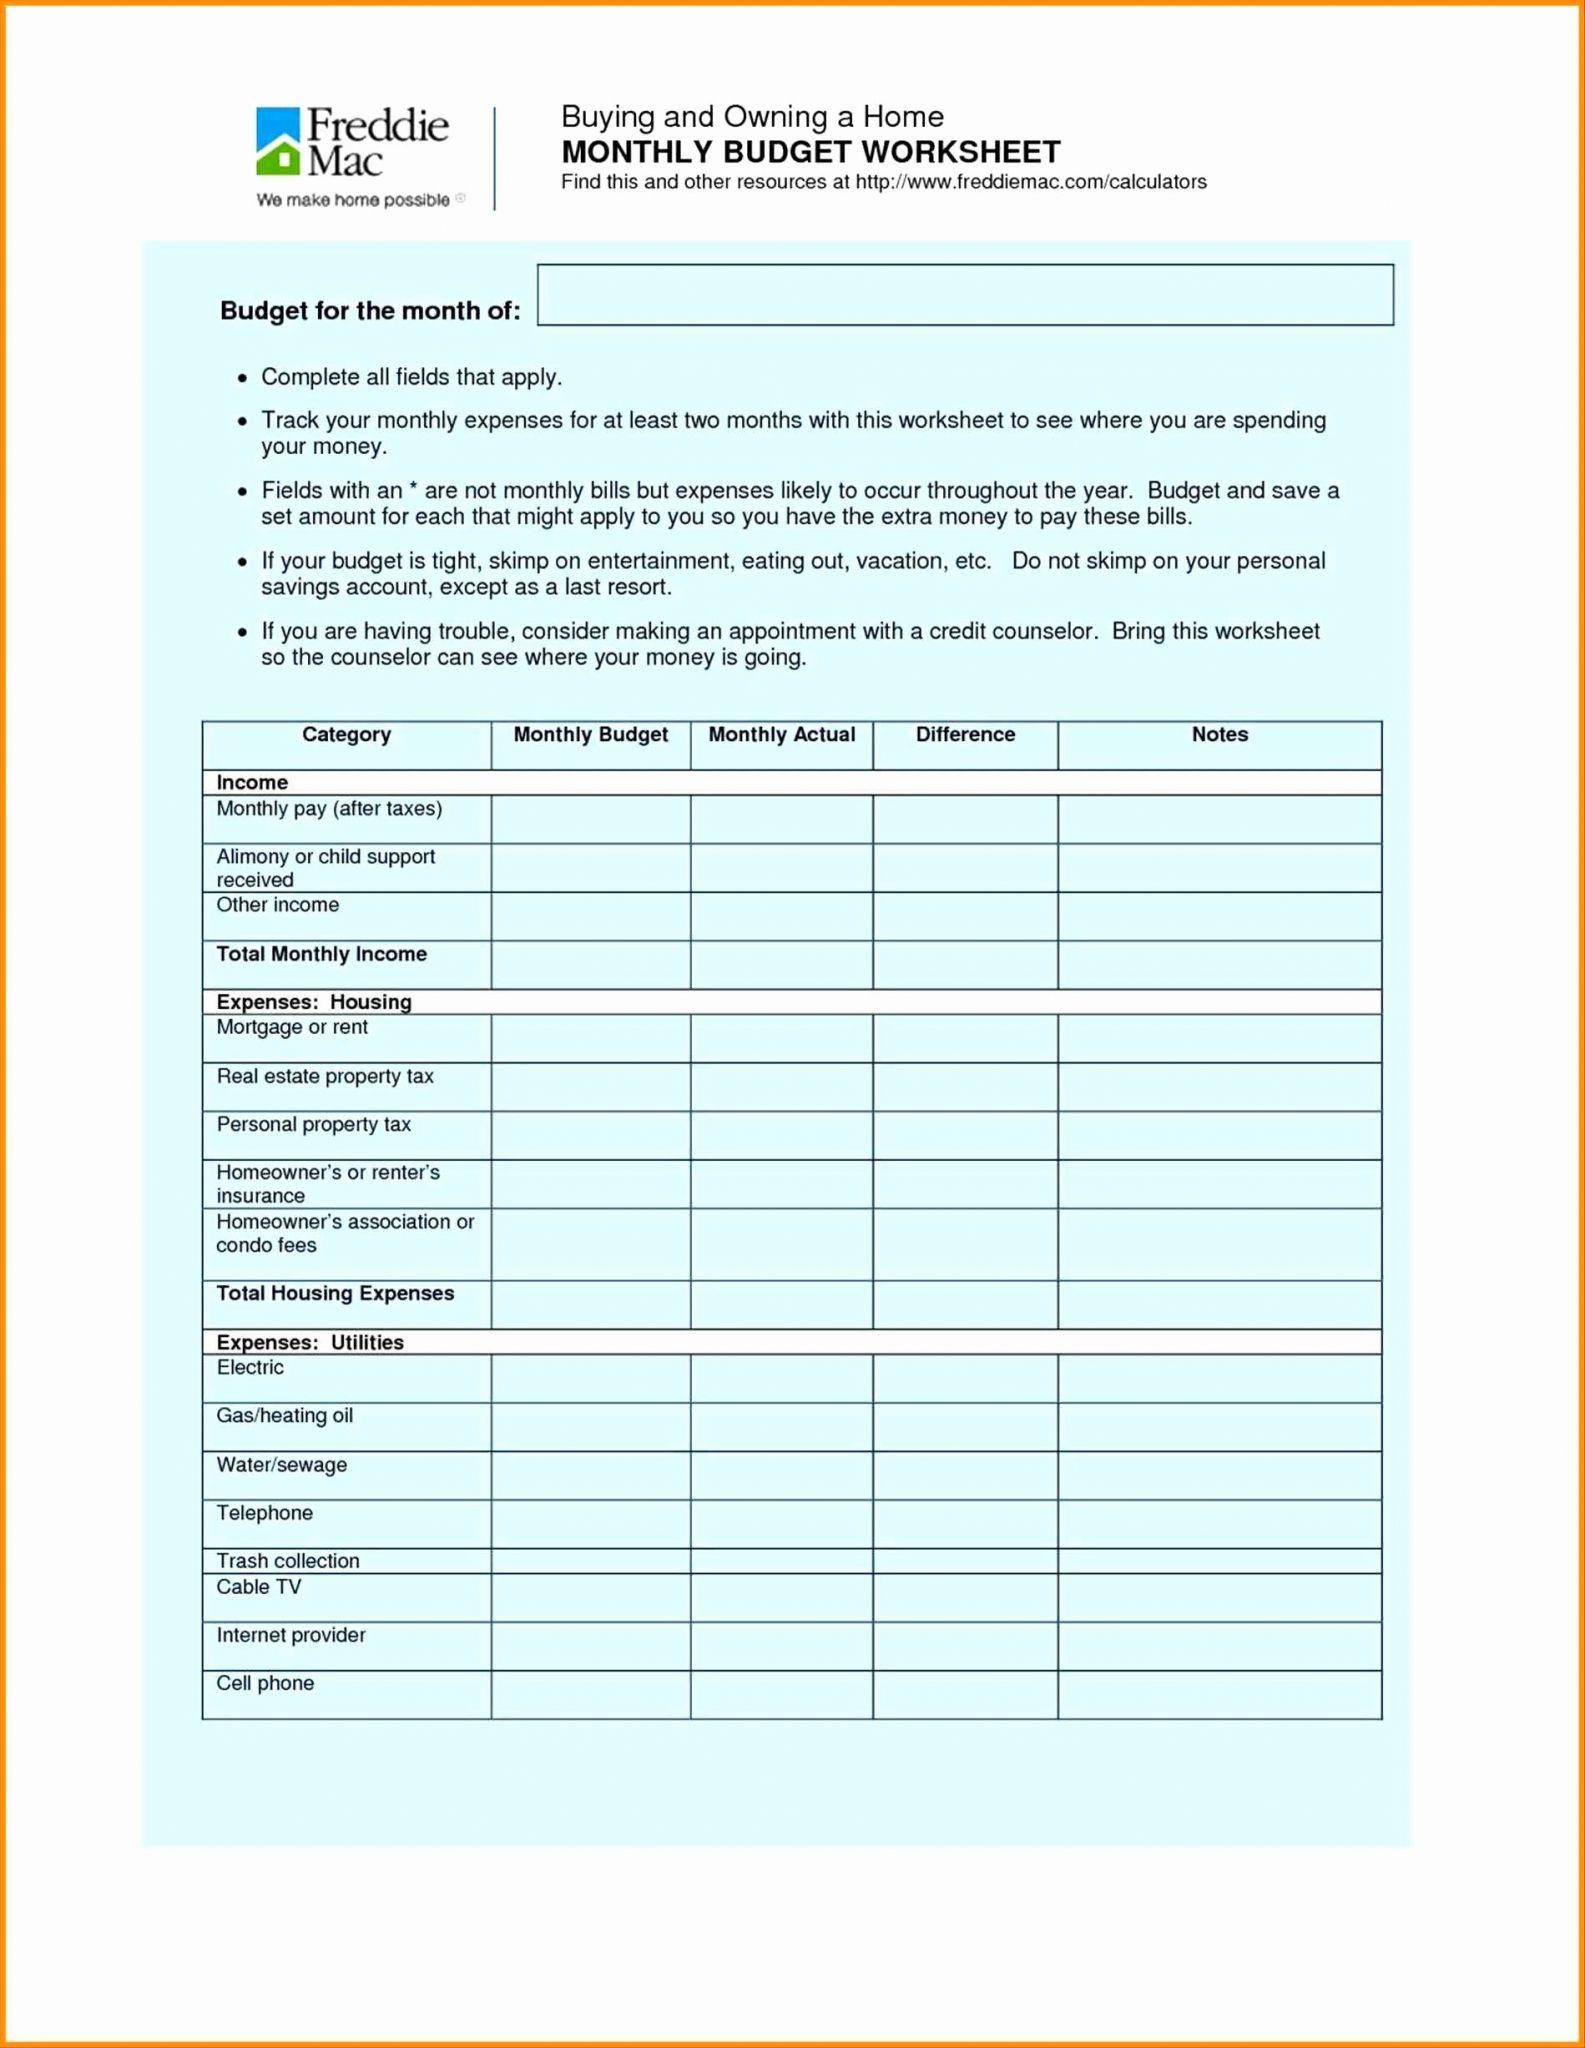 Social Security Benefits Calculator Spreadsheet